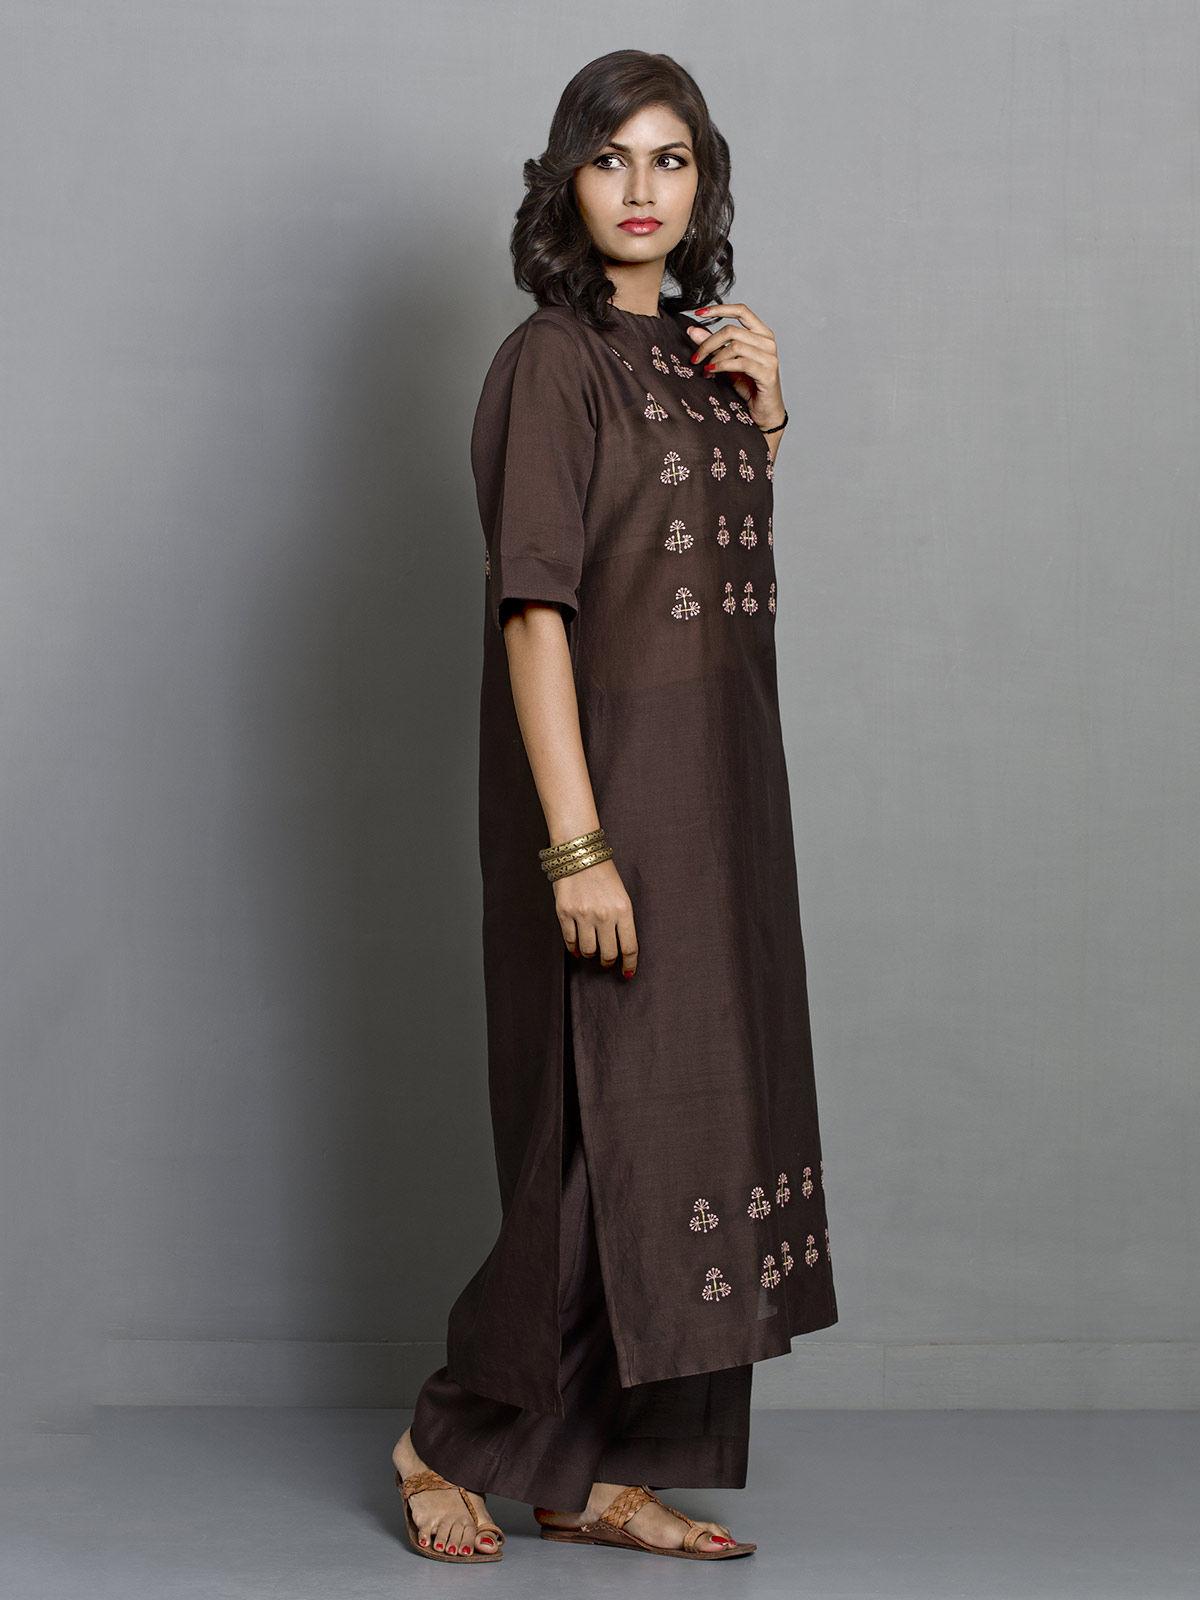 Chocolate Brown Straight Long Chanderi Kurta with Embroidered Motifs